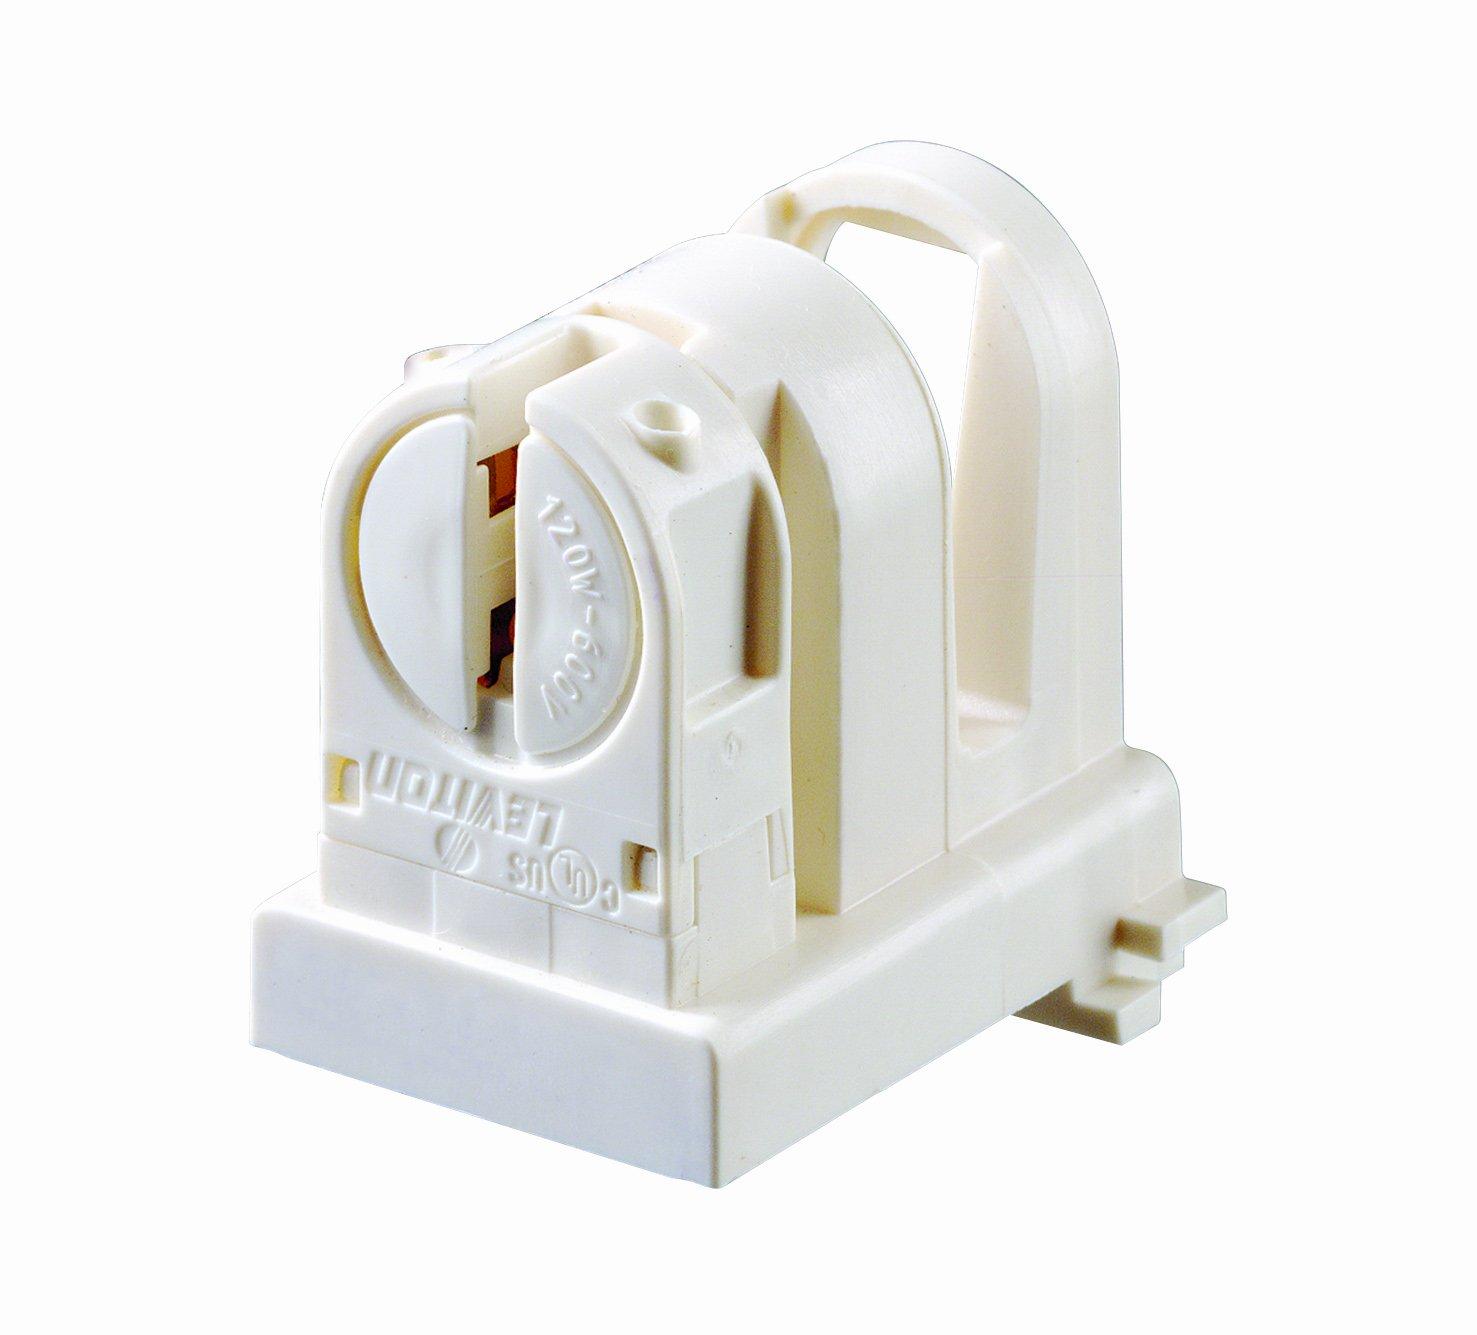 Leviton 13654 EXL Medium To Miniature Base T5 Bi Pin Standard Fluorescent Lampholder White